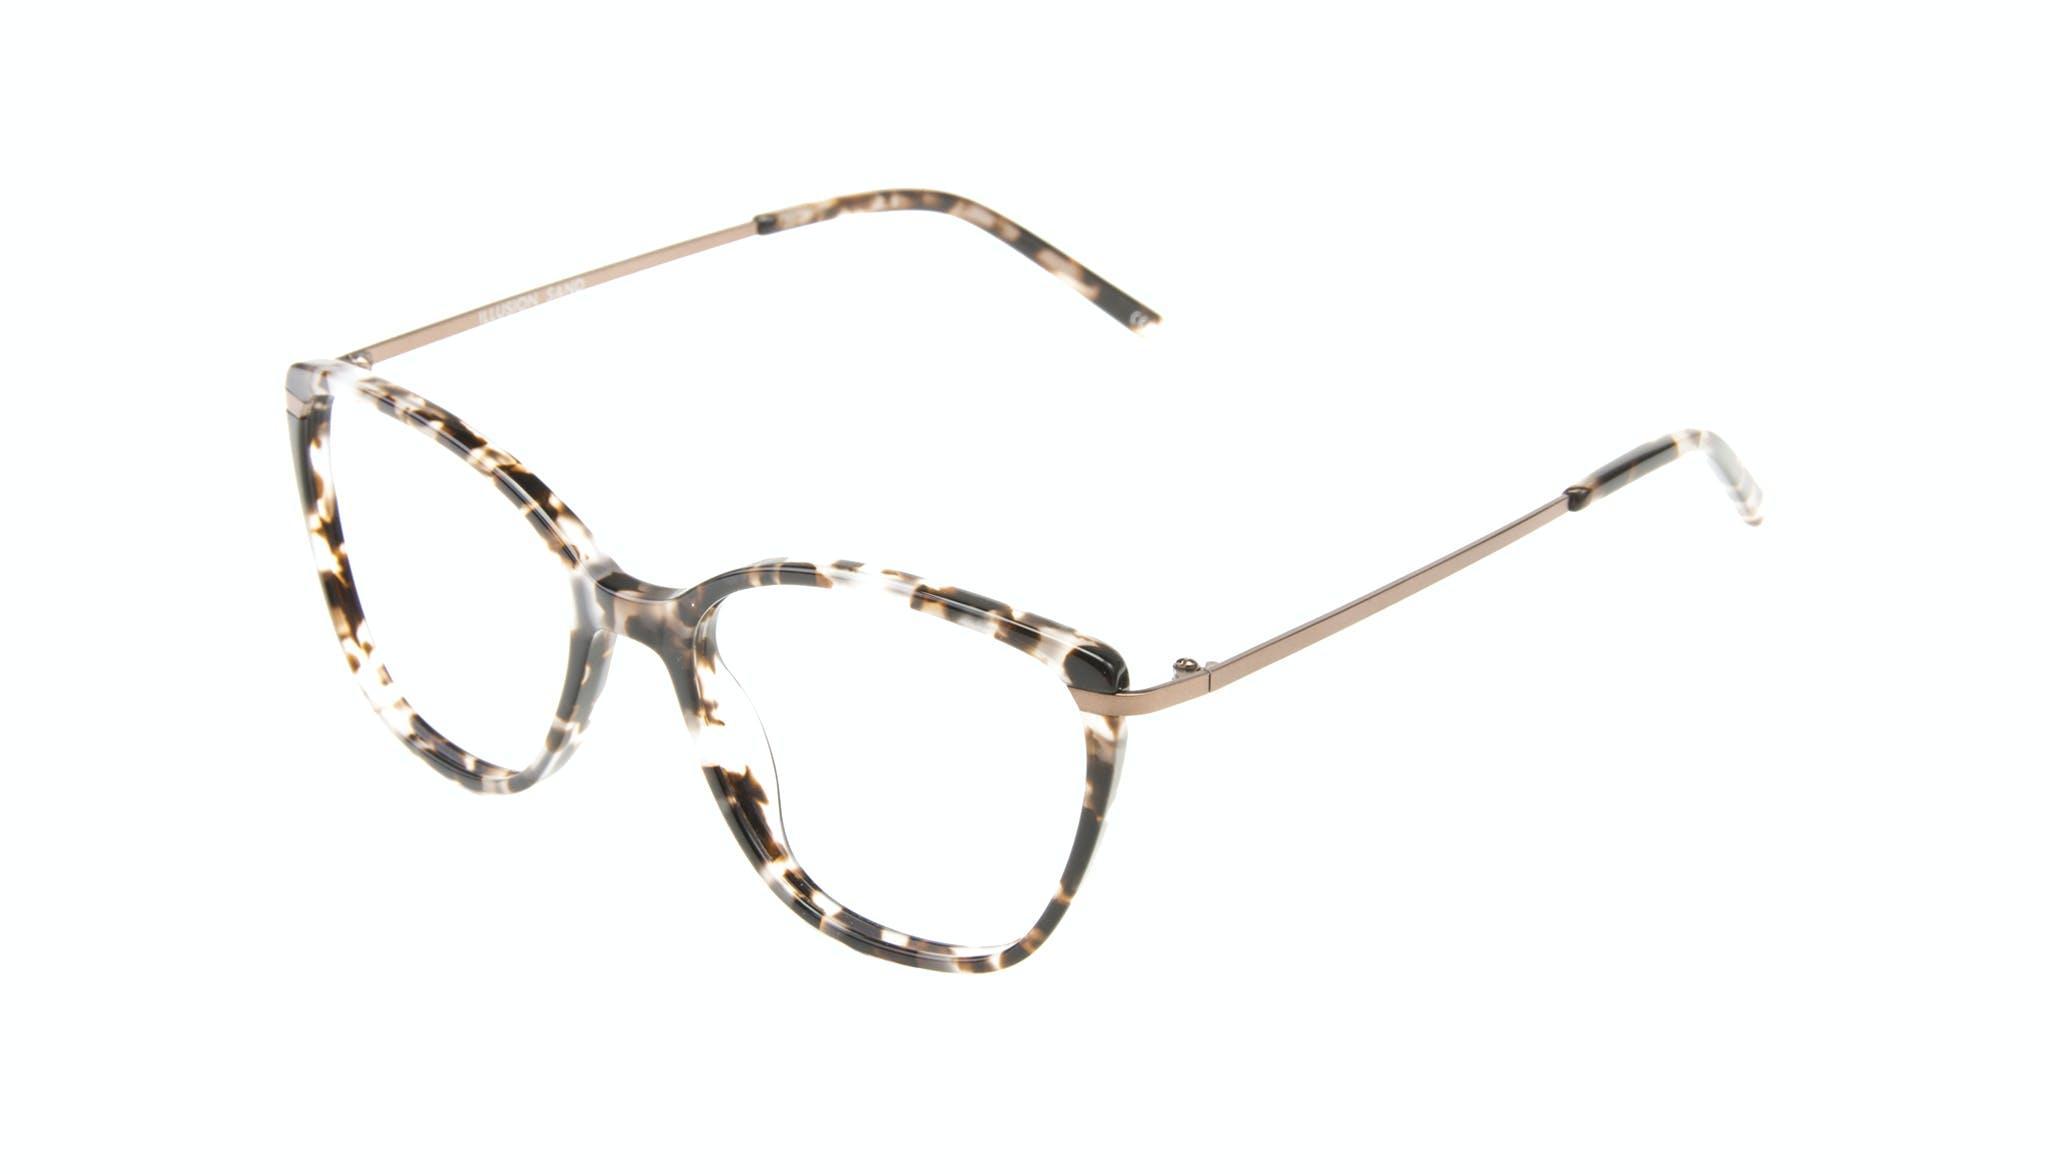 Affordable Fashion Glasses Cat Eye Rectangle Square Eyeglasses Women Illusion Sand Tilt